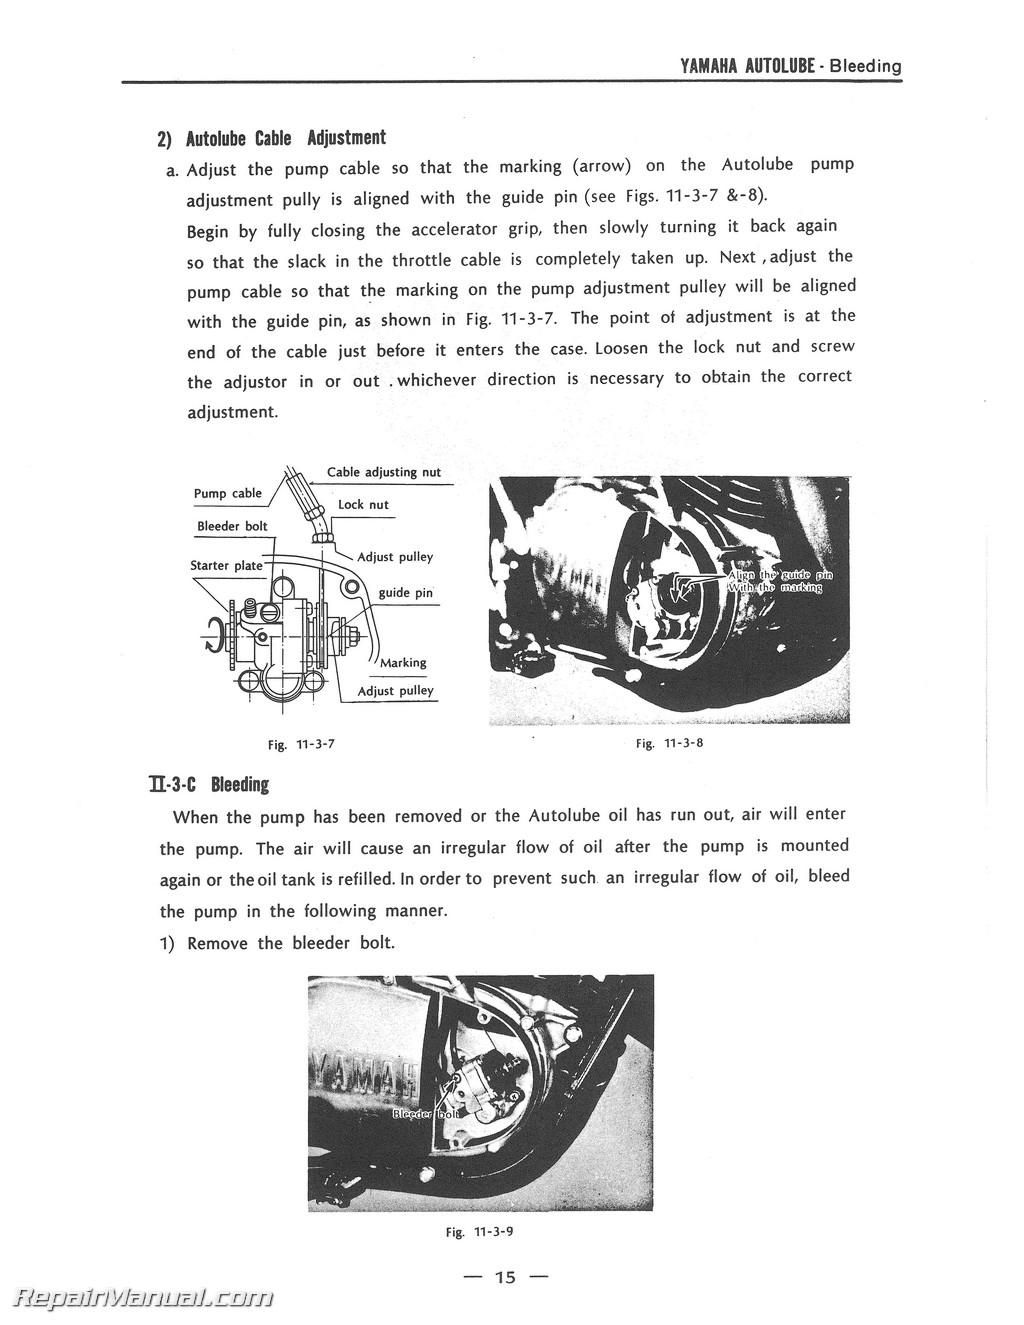 1970 1971 rt1 360cc dt2 rt2 yamaha motorcycle service manual 800 426 4214 ebay